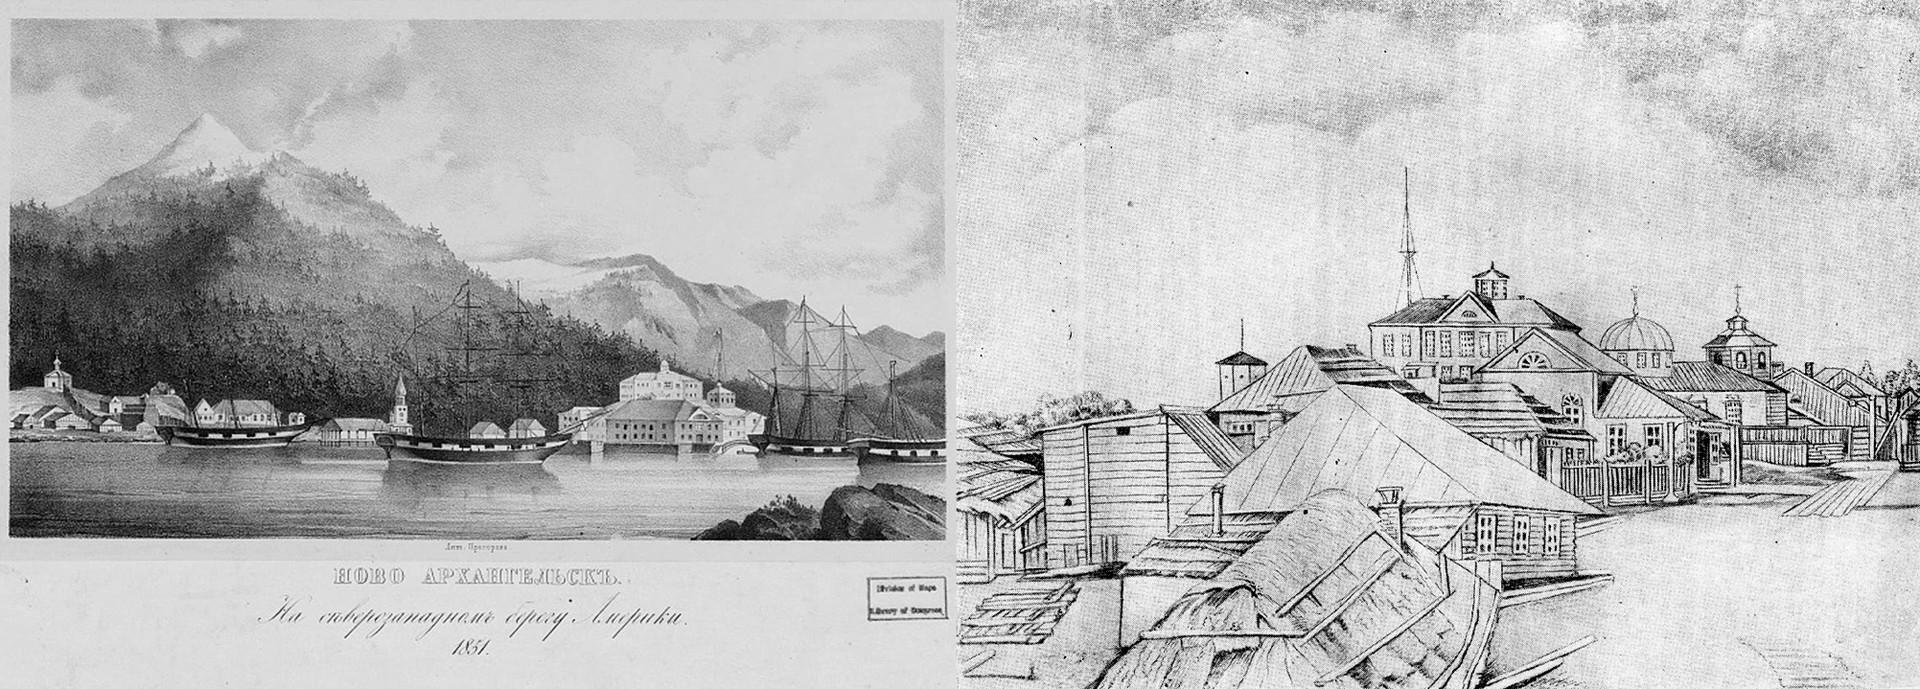 Novo-Arkhangelsk en 1851